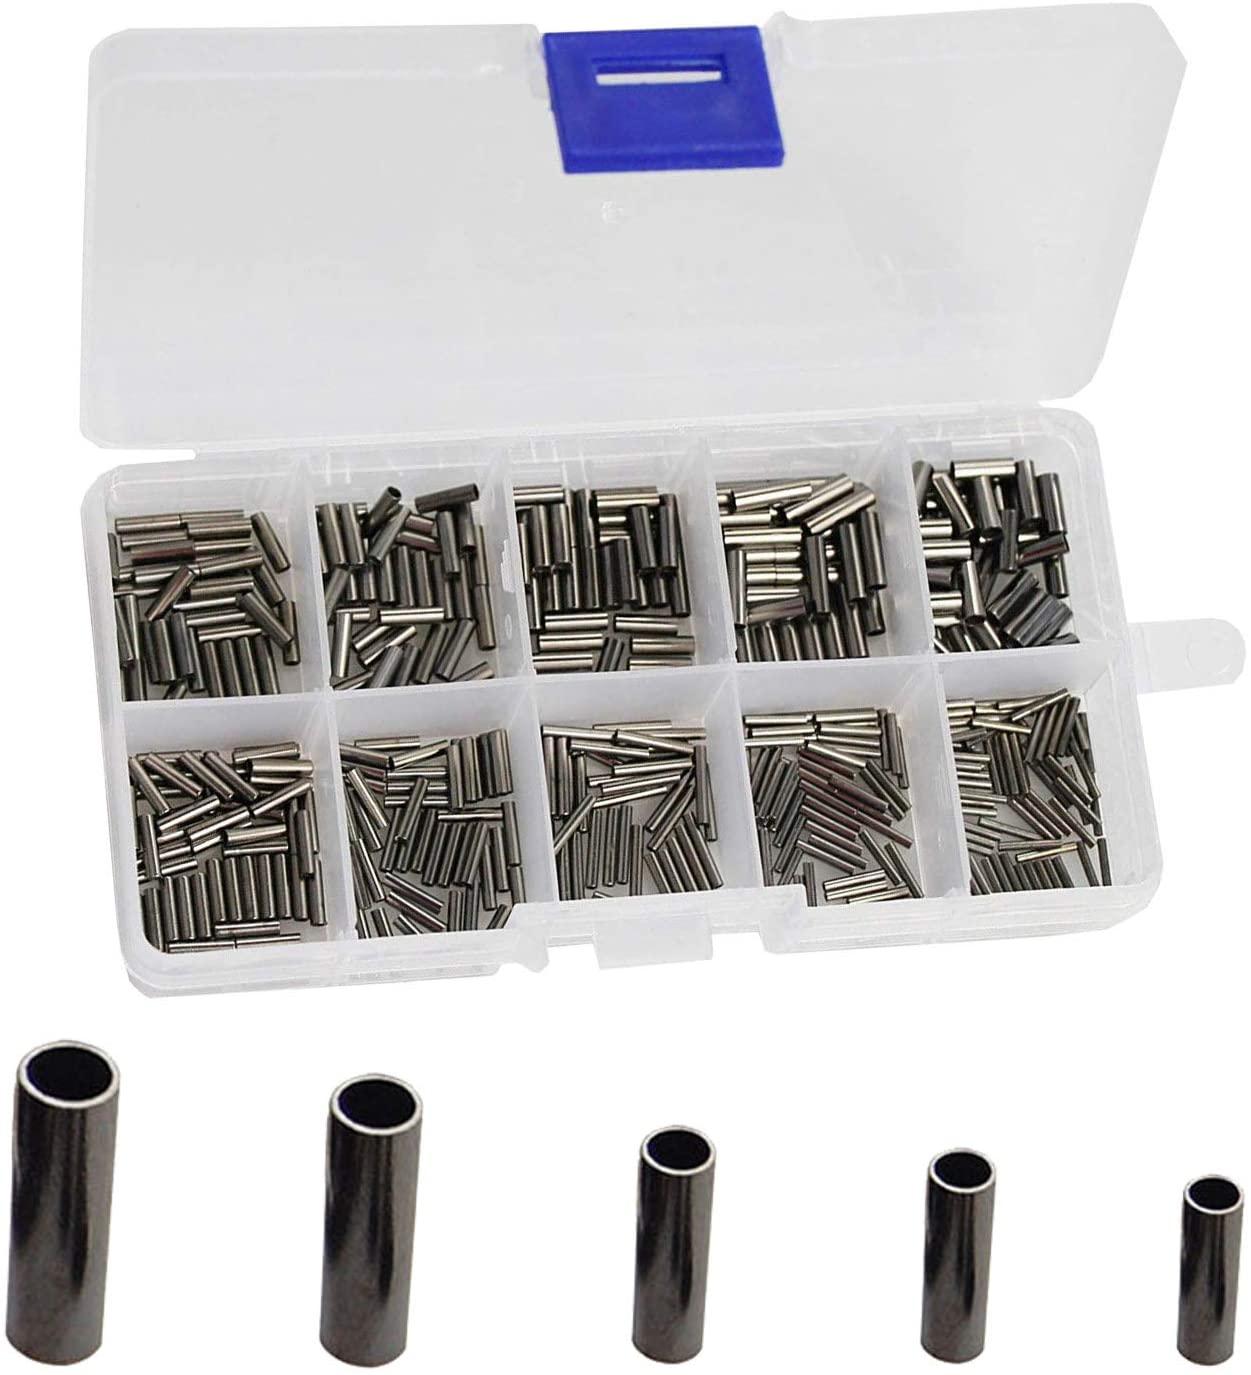 100pcs/box-400pcs/box Size: 1.2-2.4mm Fishing Wire Leader Crimps Single Barrel Crimping Sleeves 100% Copper Tube Connector Fishing Tackle Kit